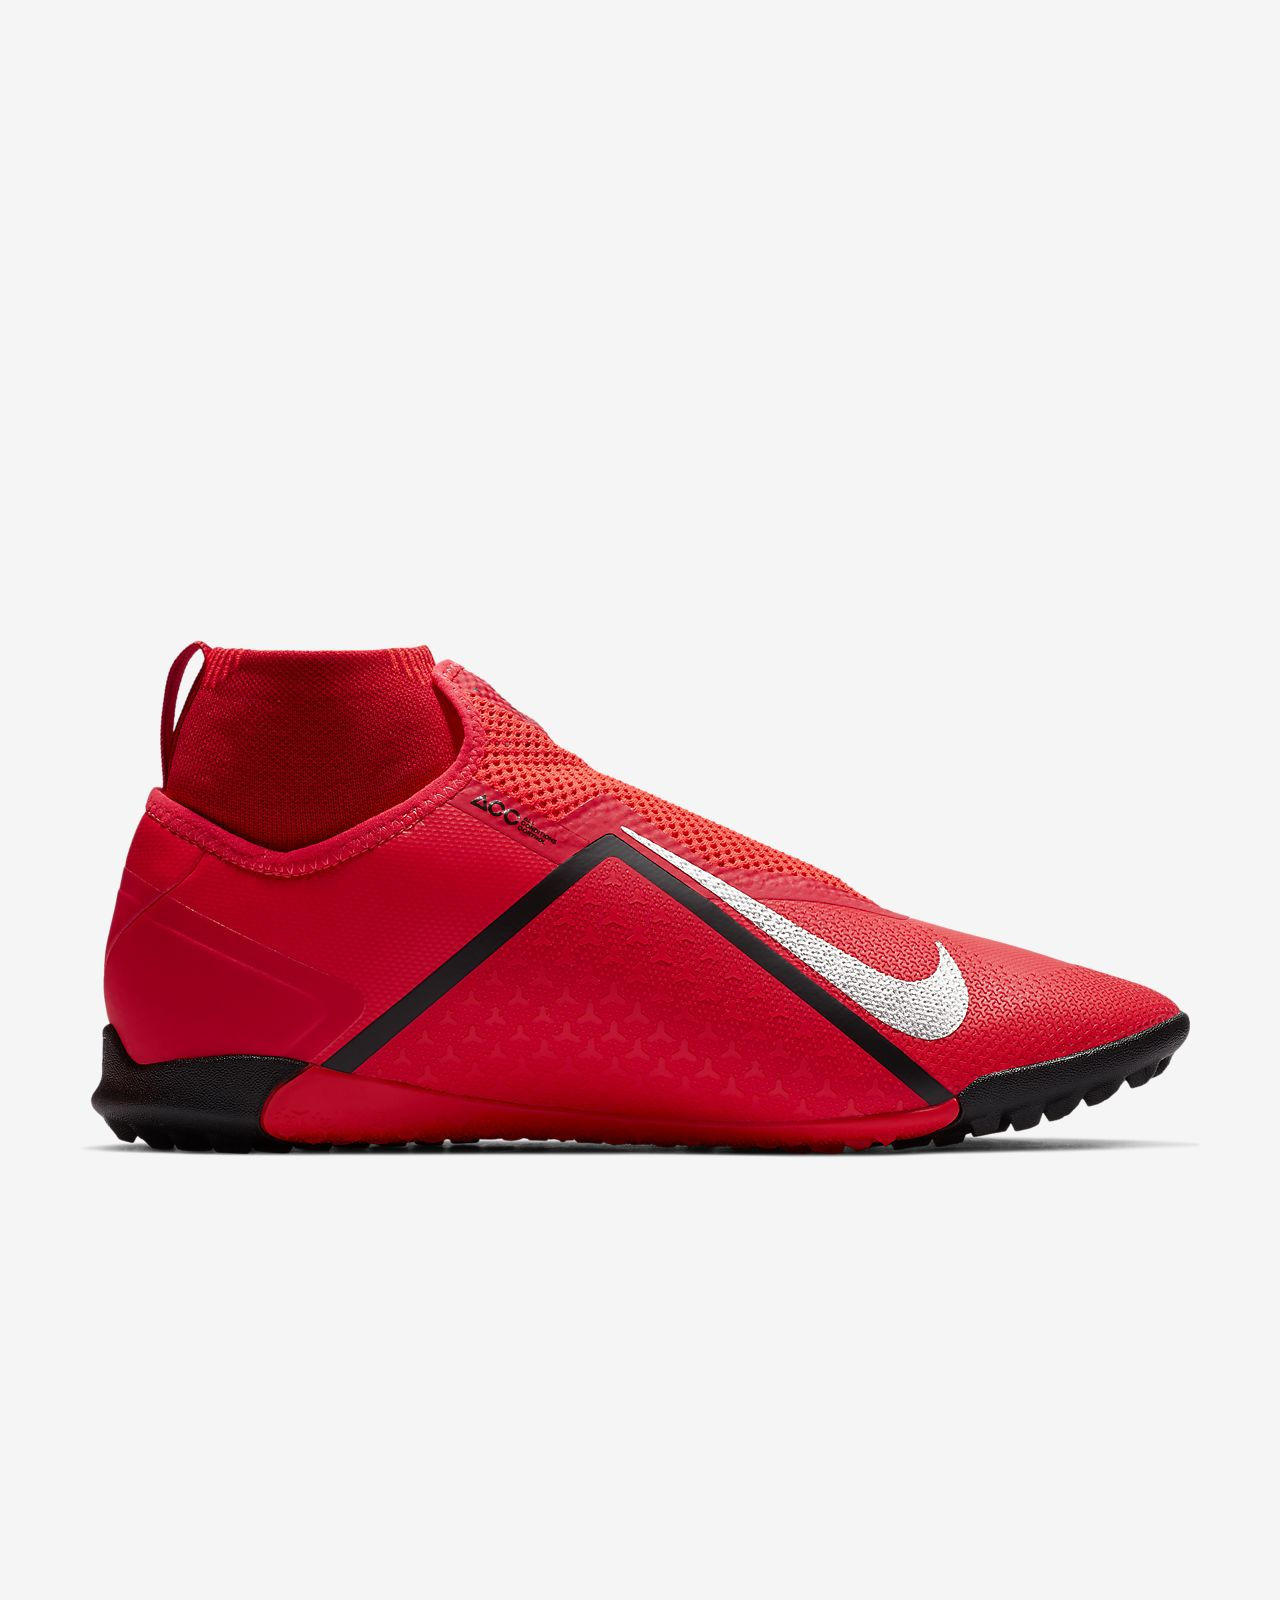 competitive price e7f8e 31b18 ... Nike React PhantomVSN Pro Dynamic Fit Game Over TF Turf Football Shoe